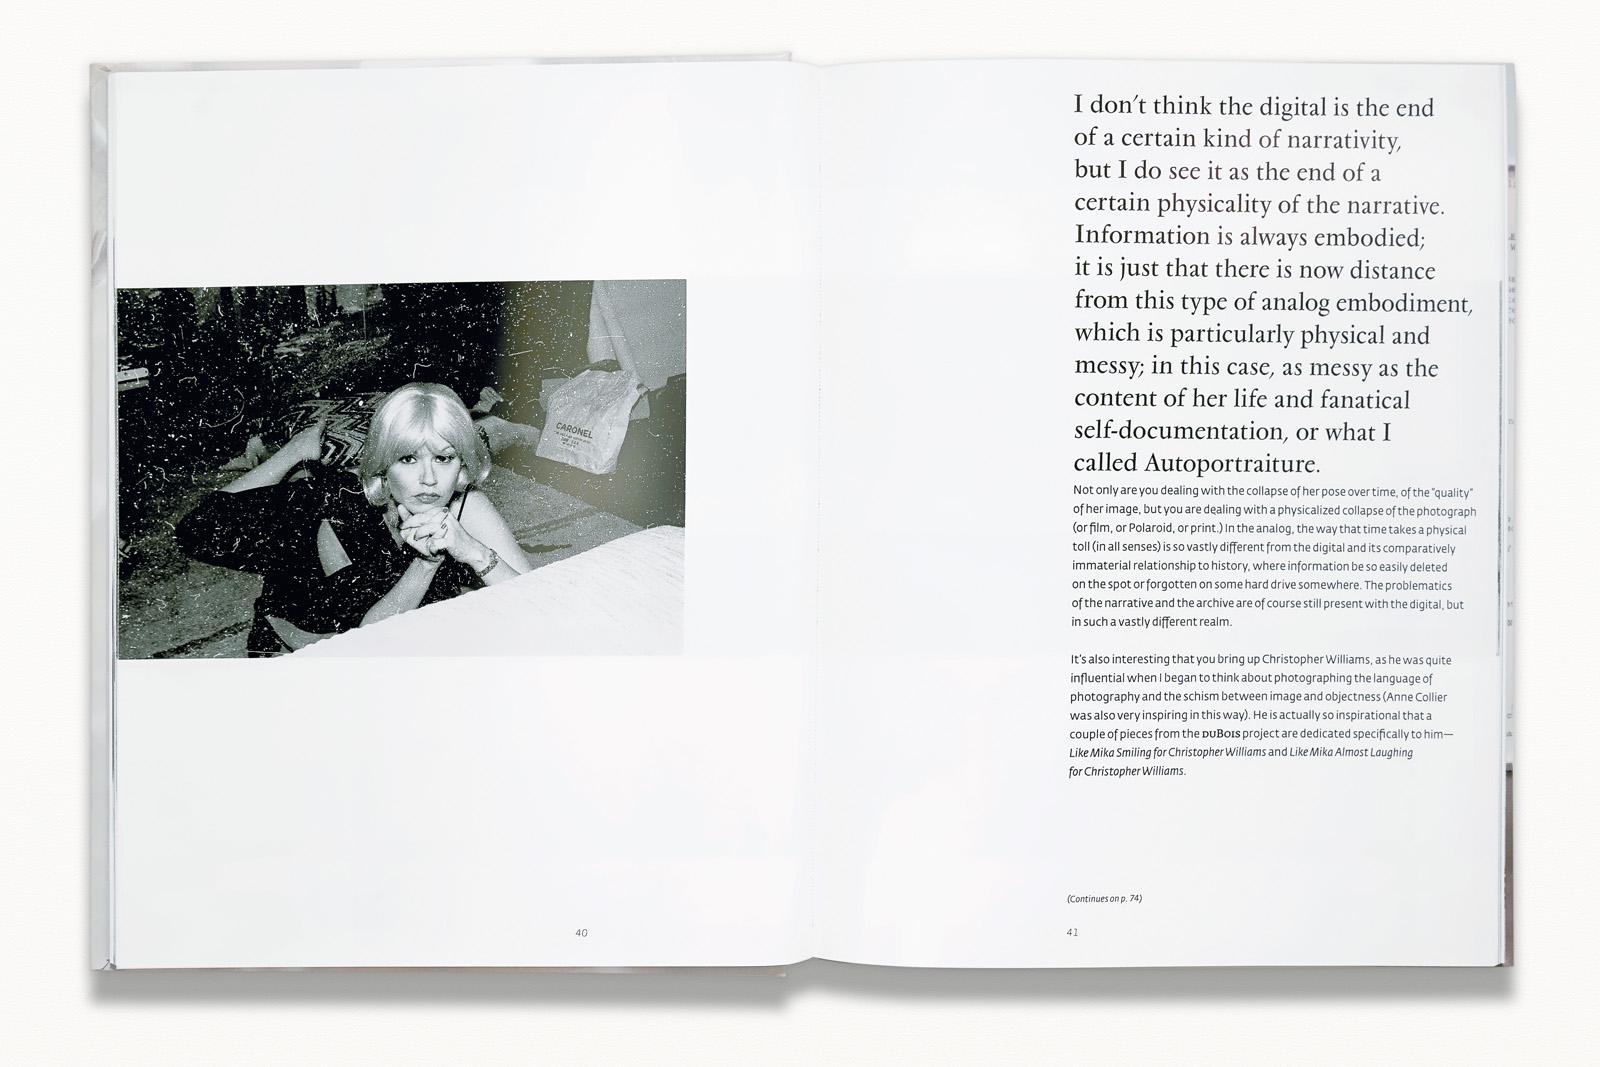 Re-Disappearance-p.40-41-final.jpg